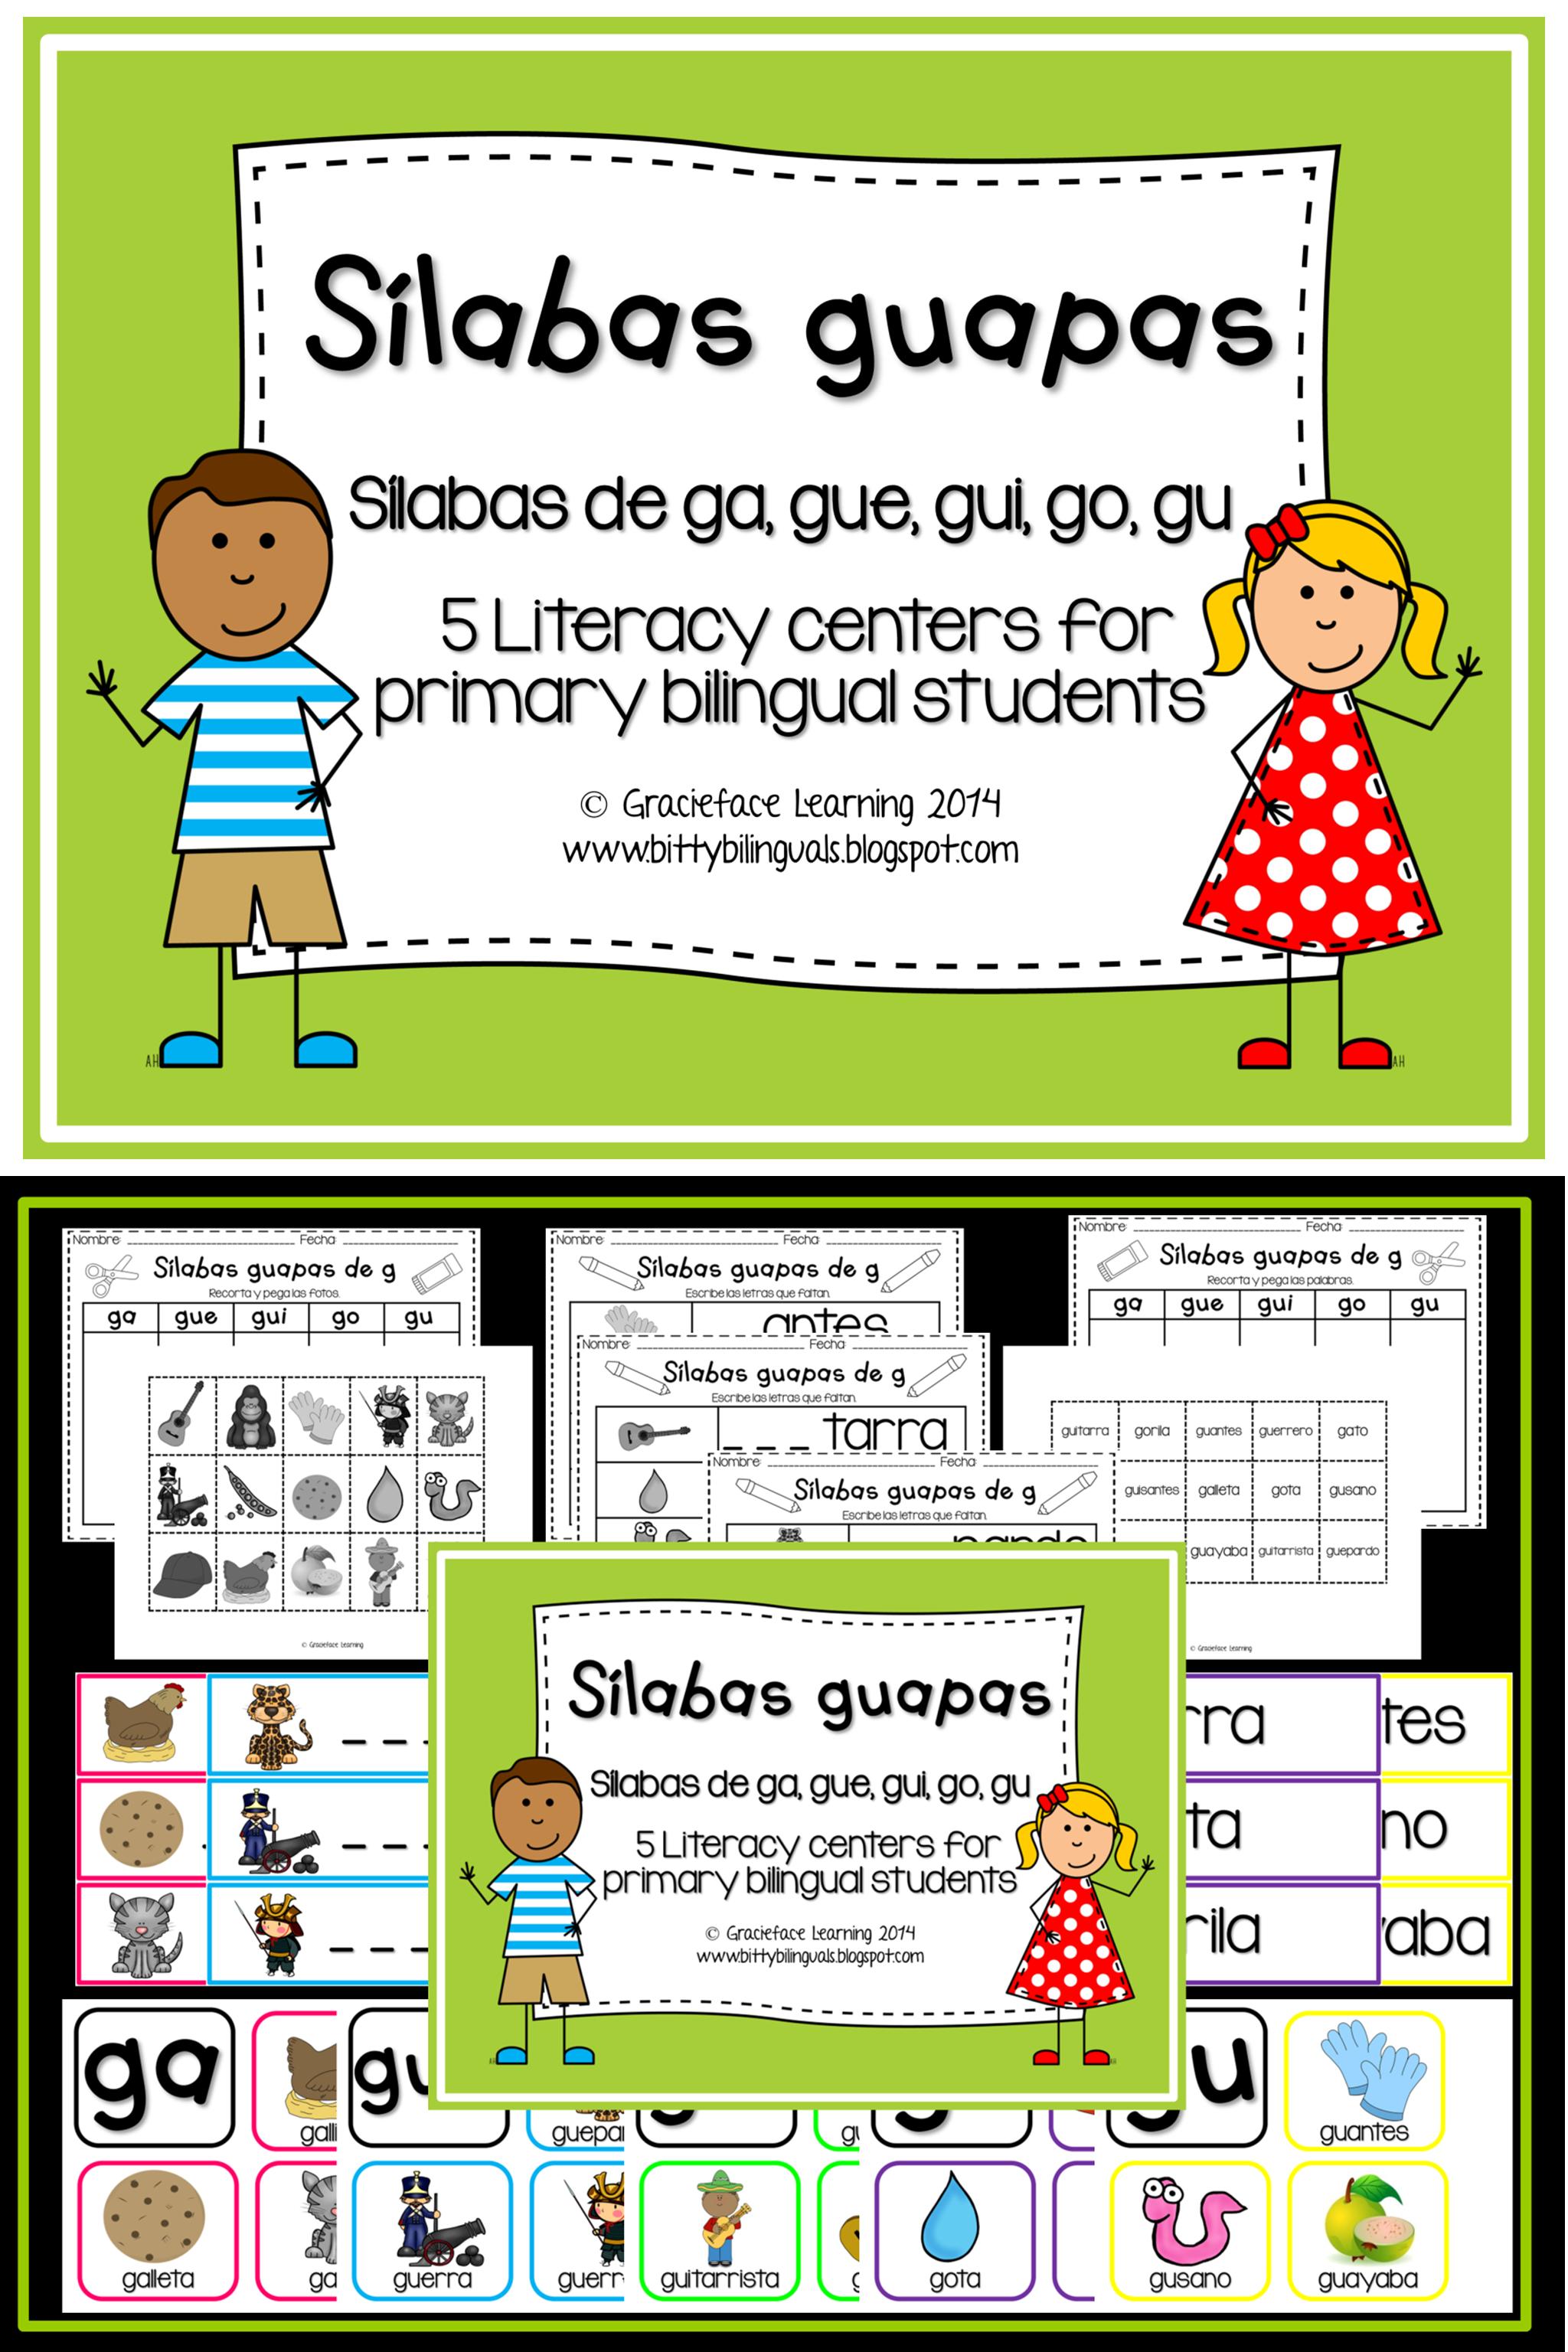 Sílabas guapas - Spanish Phonics Activities for ga, gue, gui, go, gu ...